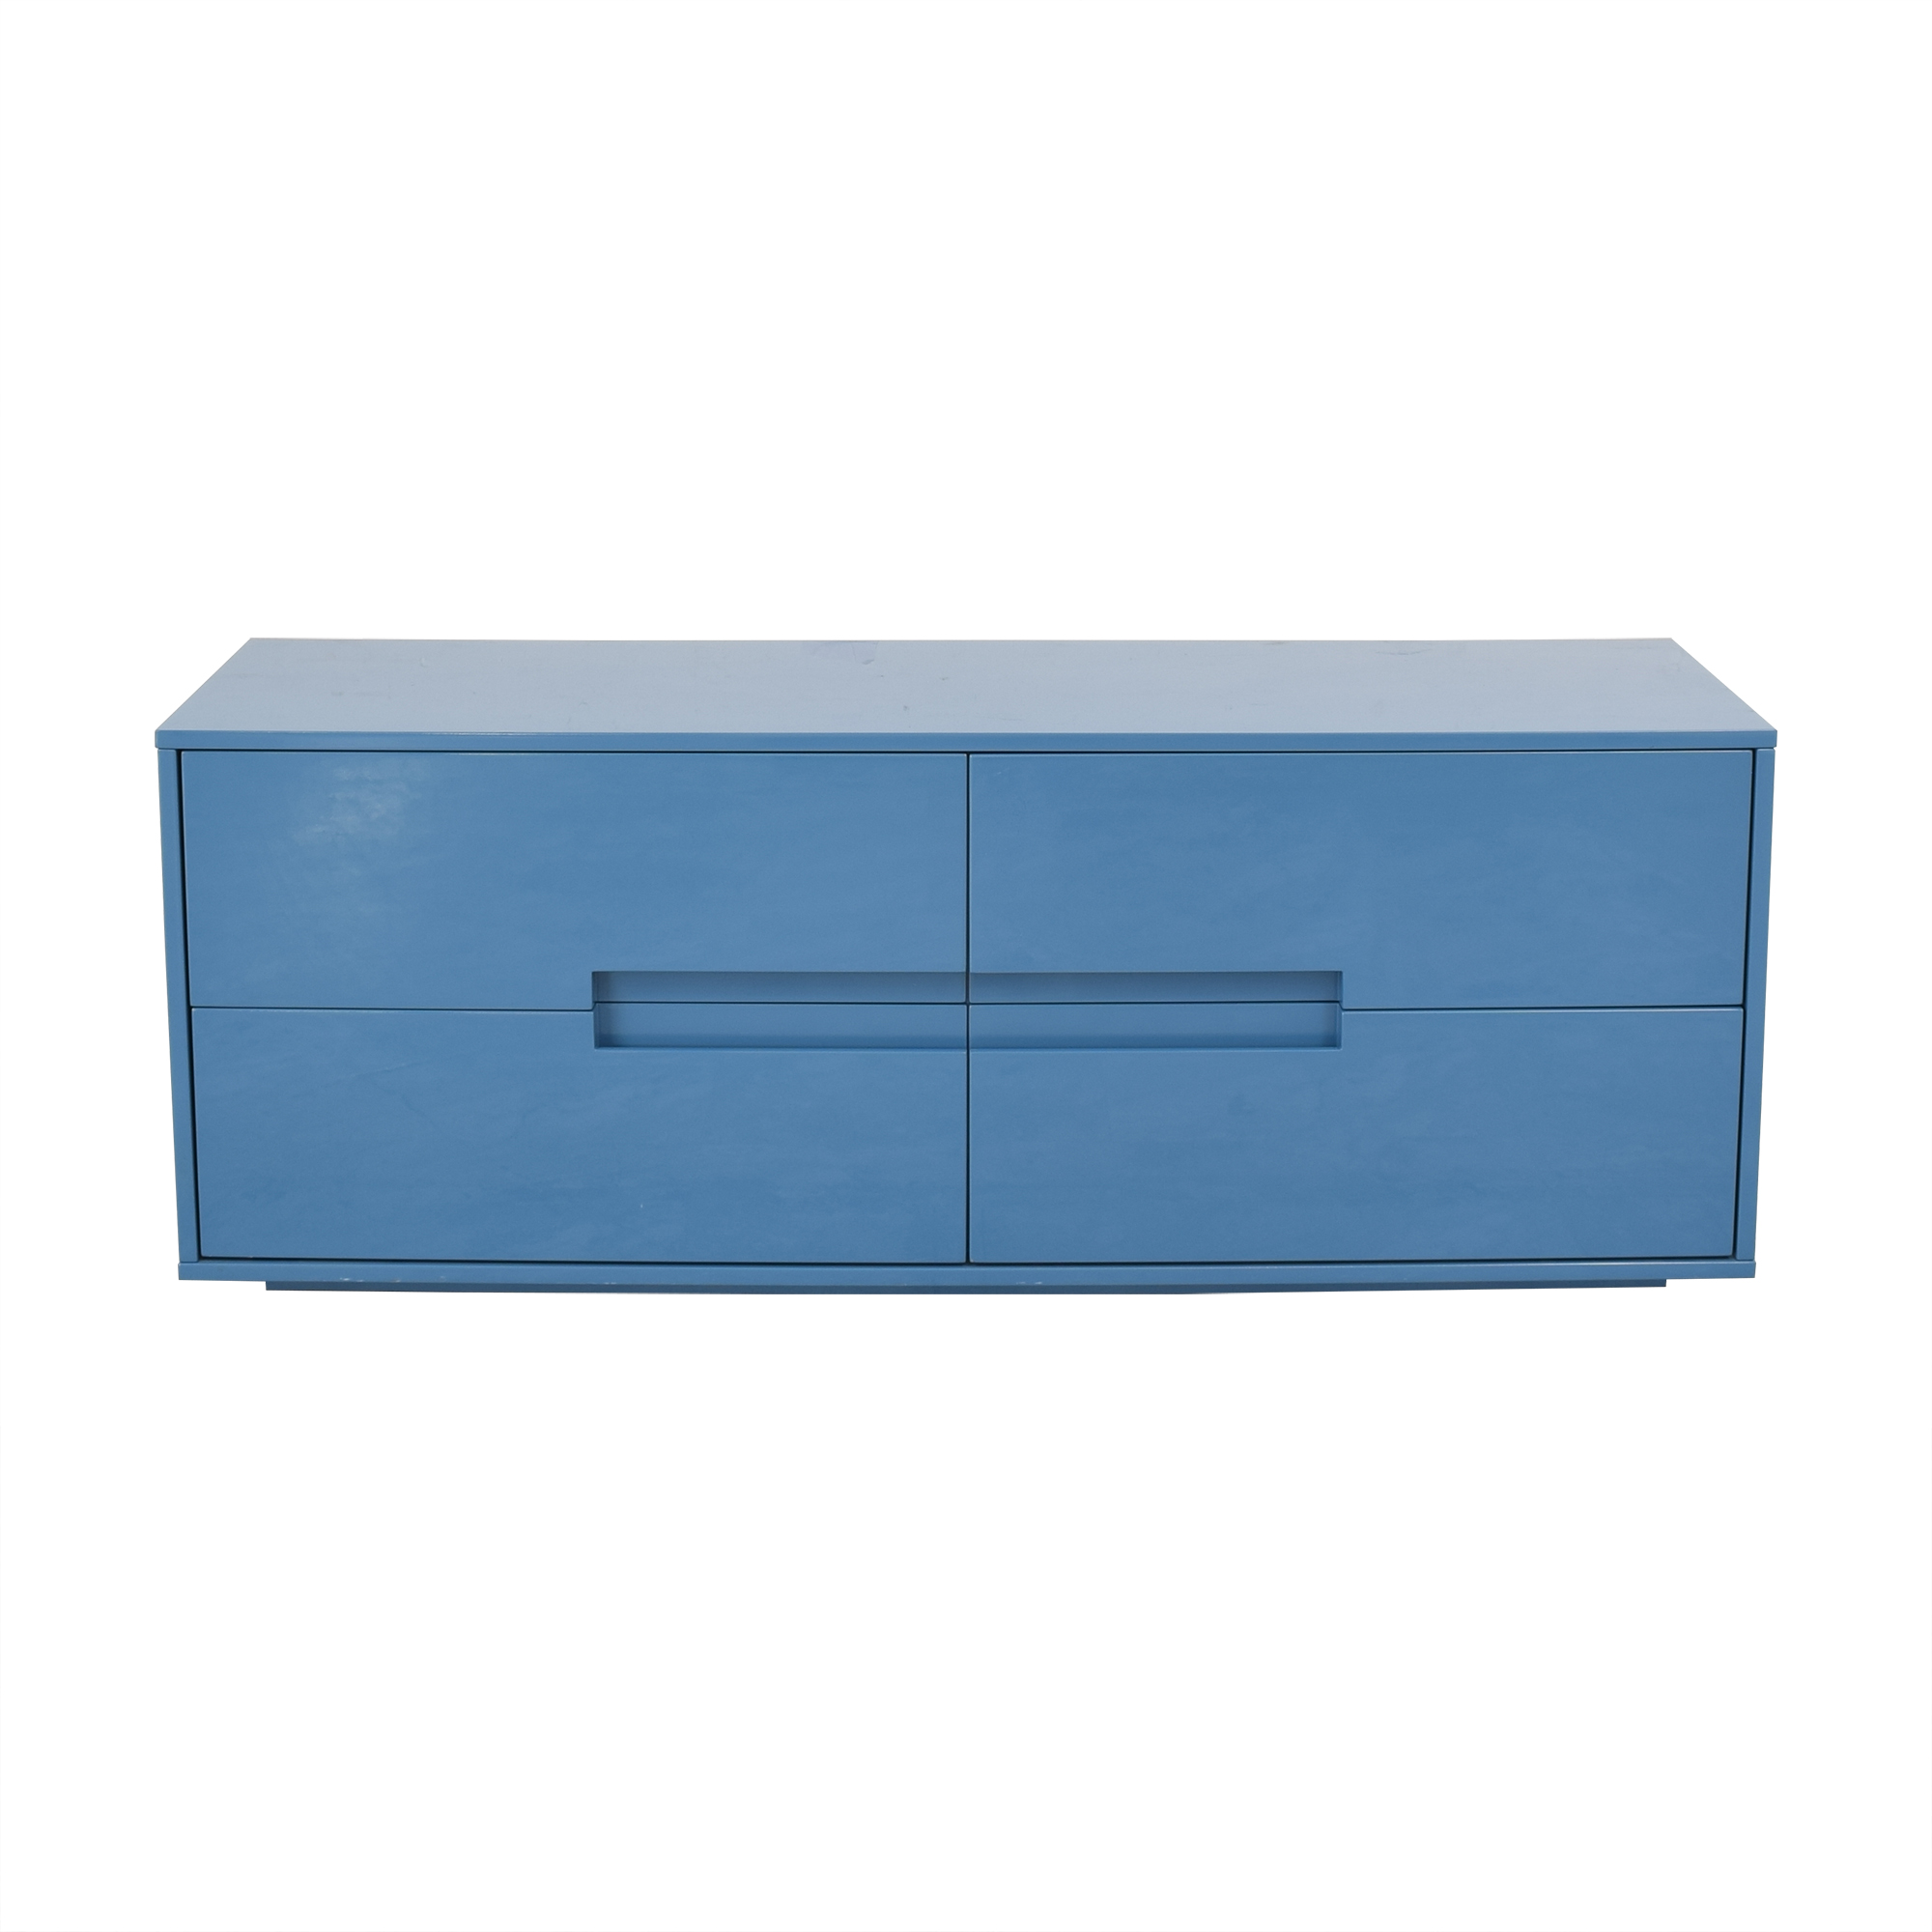 shop CB2 Latitude Low Dresser CB2 Media Units